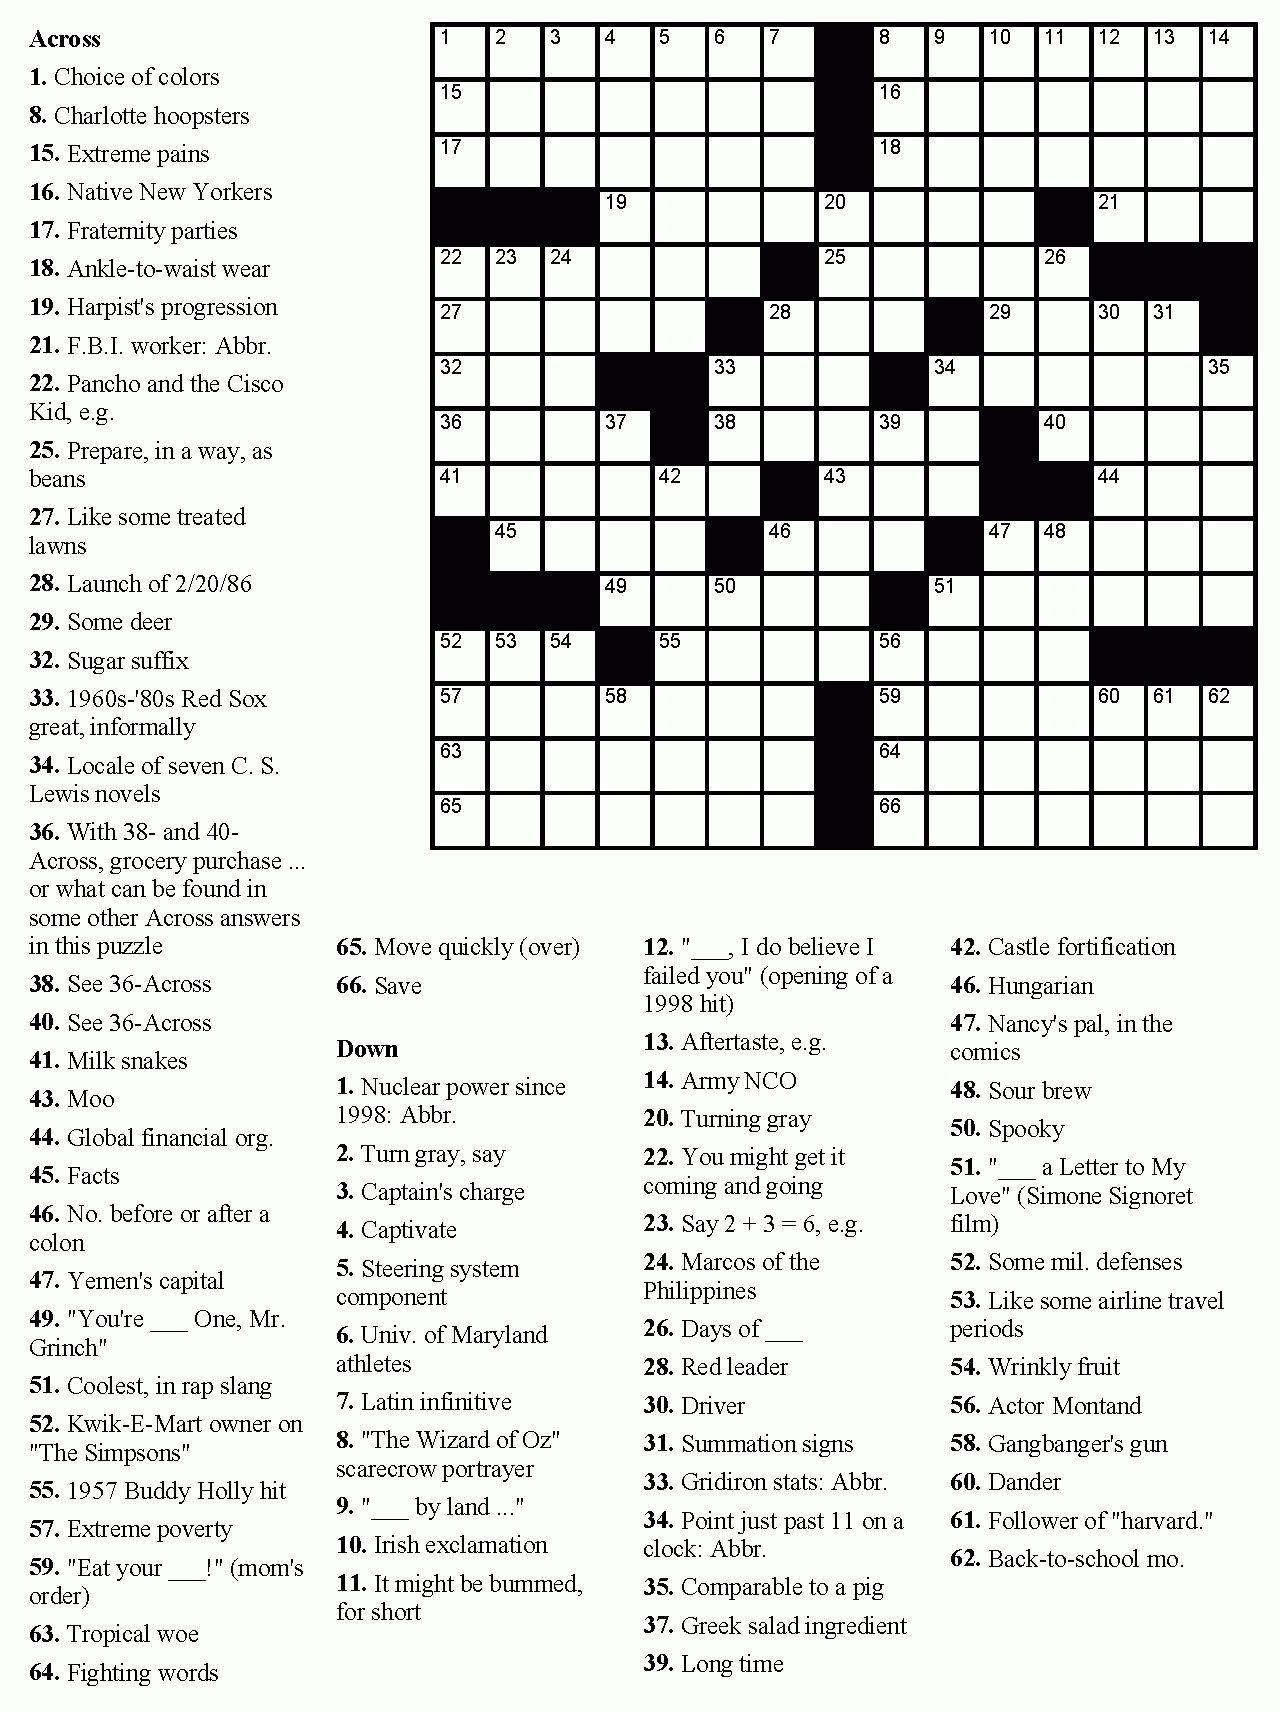 Printable Hard Crossword Puzzles Pdf Free Printable Crossword Puzzles Printable Crossword Puzzles Crossword Puzzle Maker